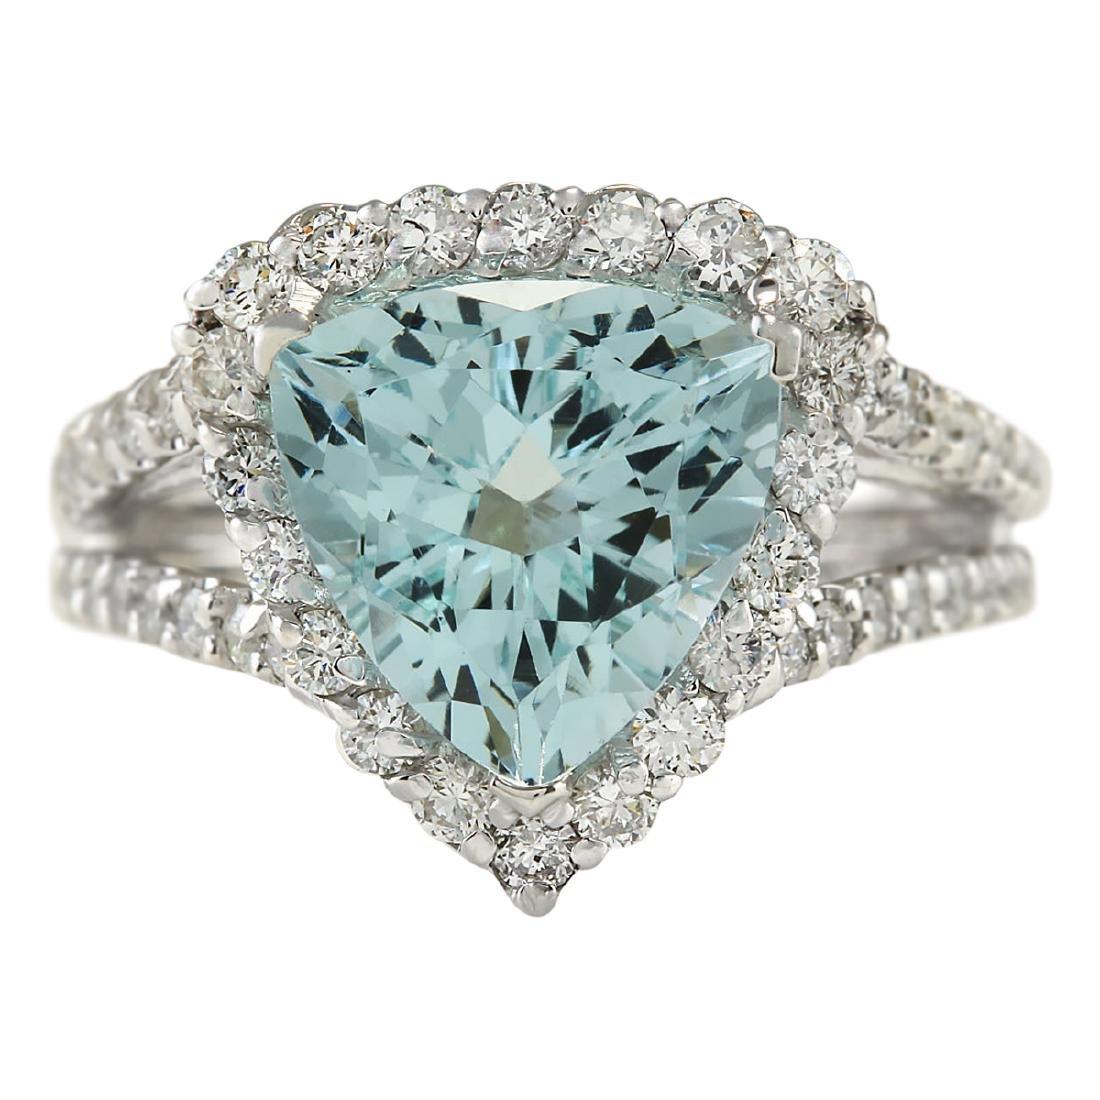 3.52 CTW Natural Aquamarine And Diamond Ring In 18K